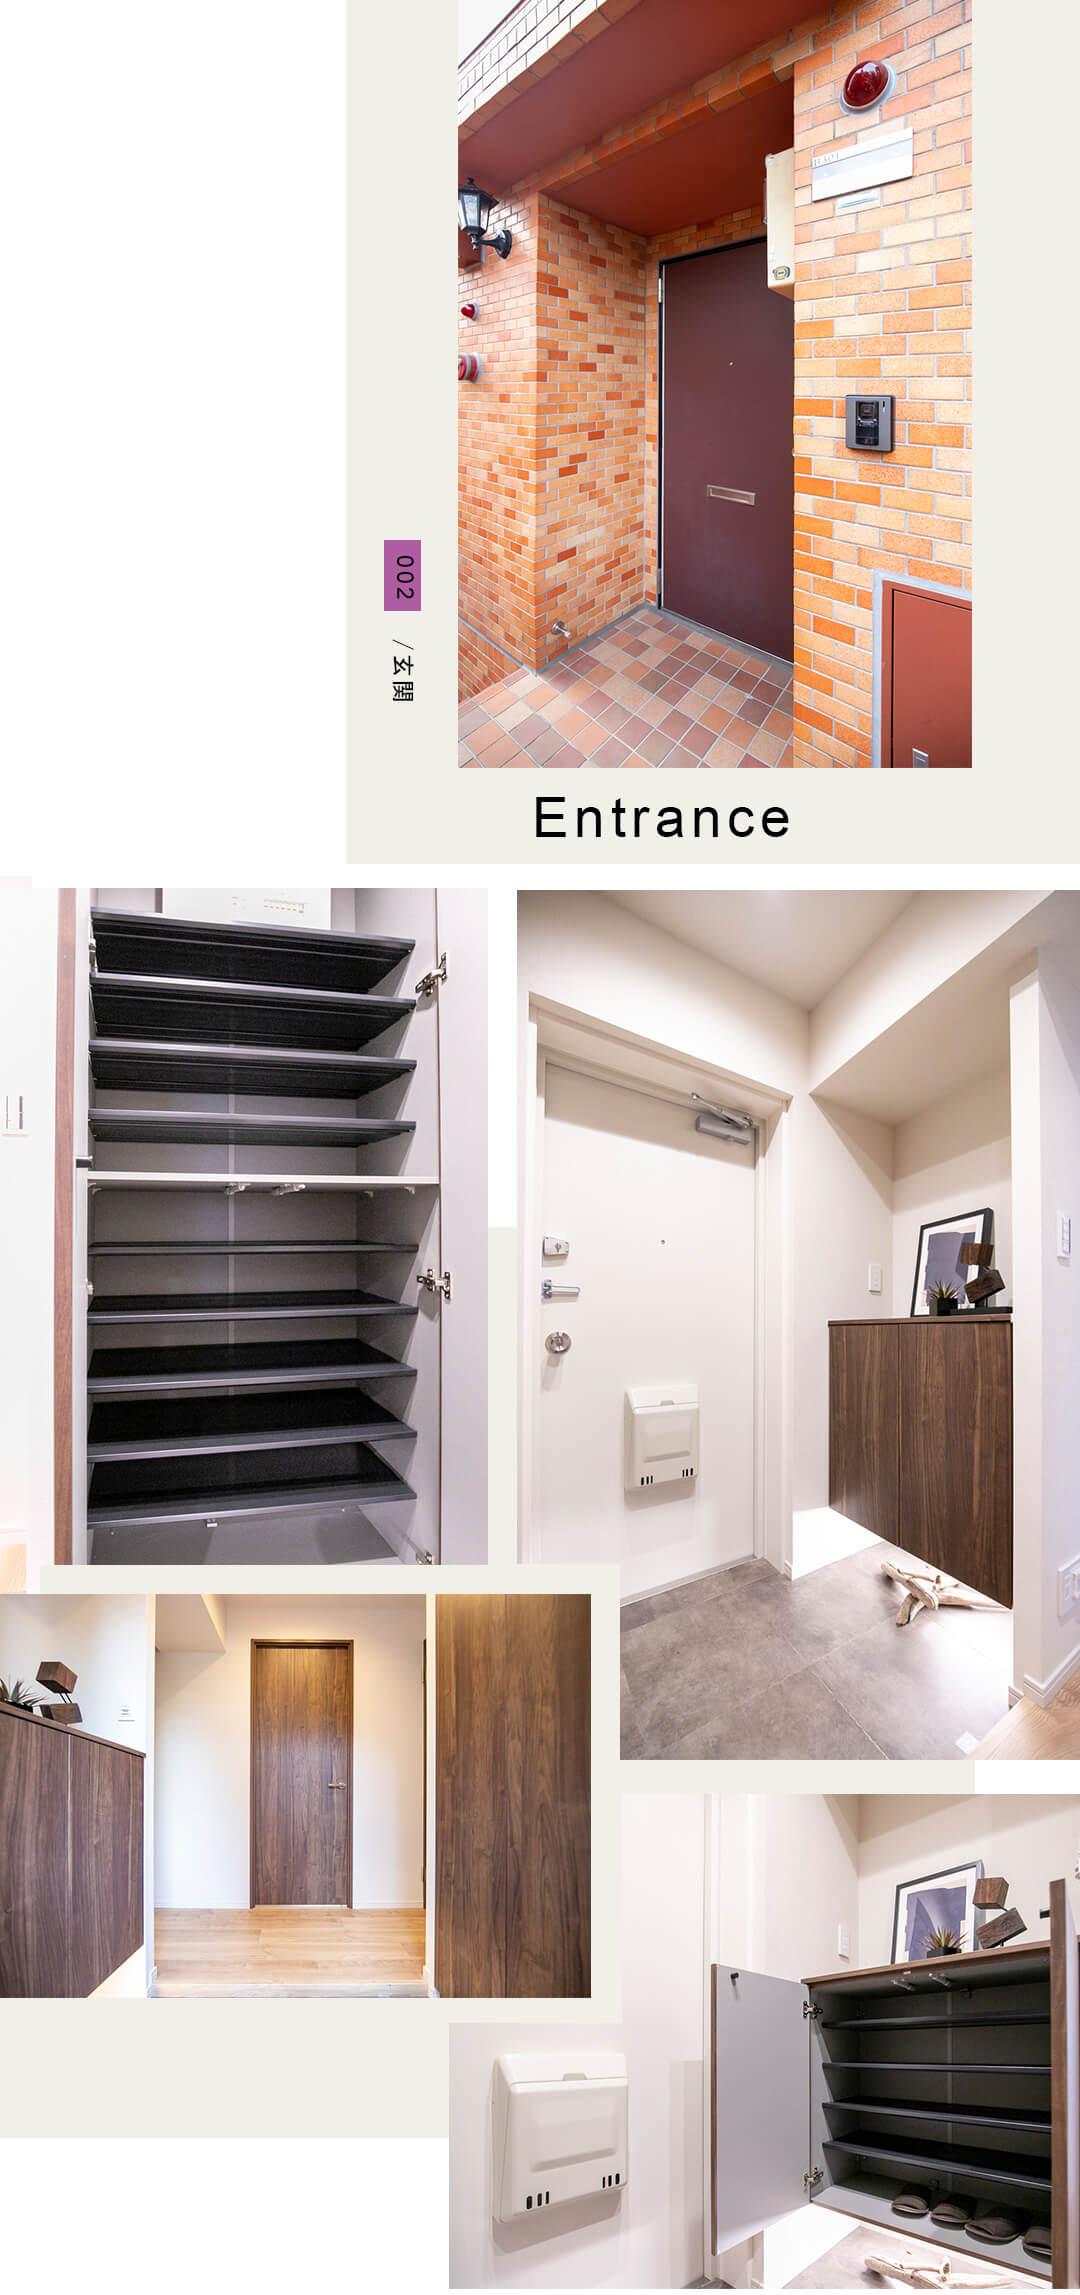 002,Entrance,玄関